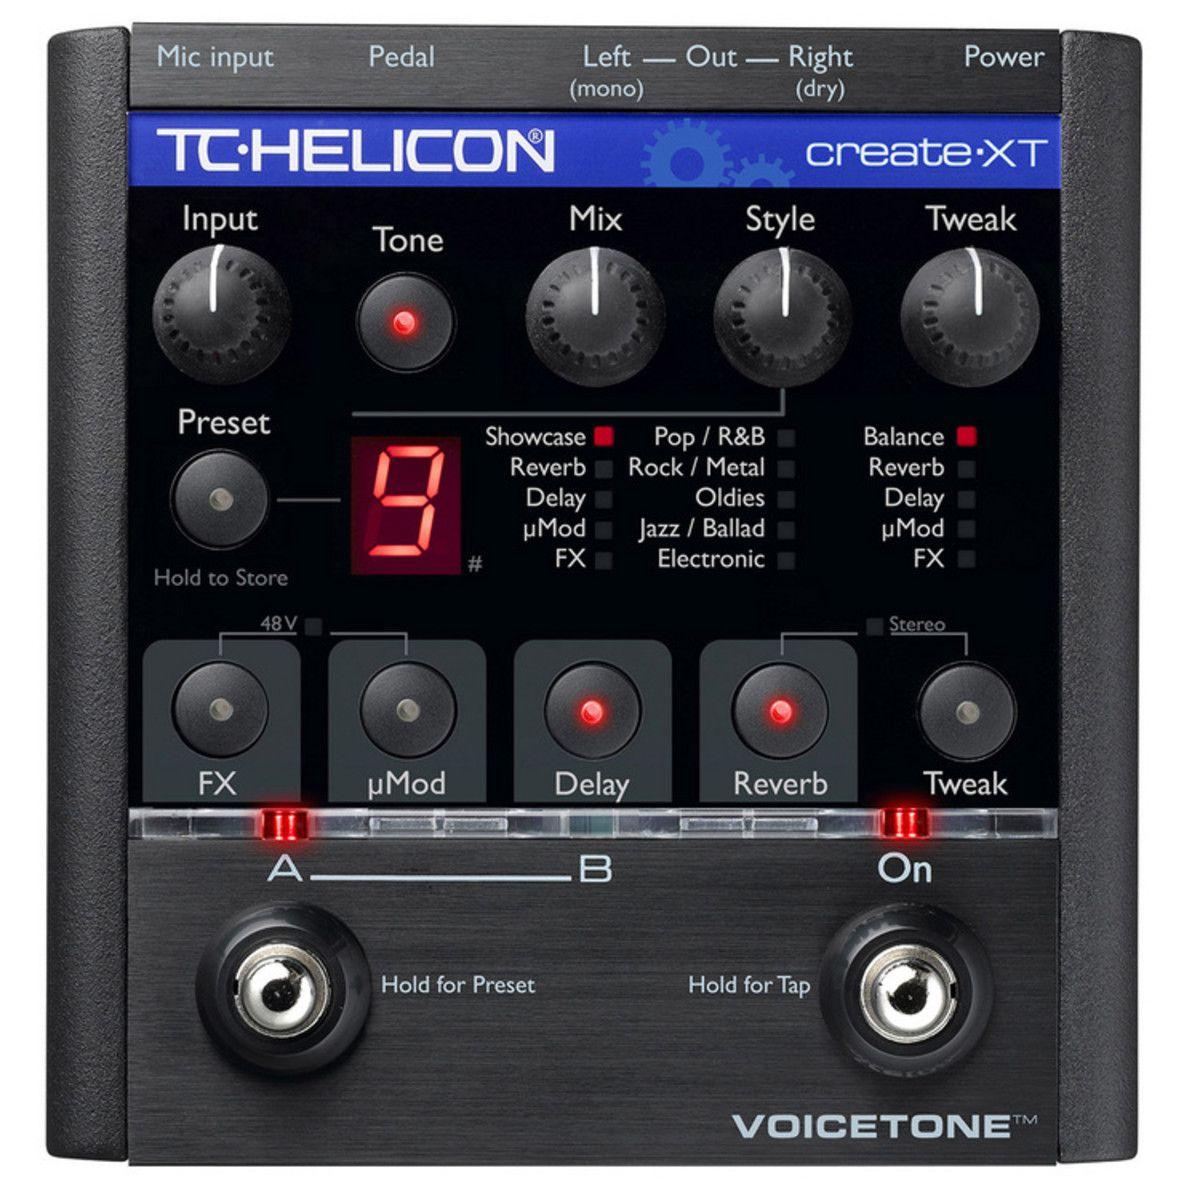 Pedal Voz VoiceTone Create XT - TC Helicon